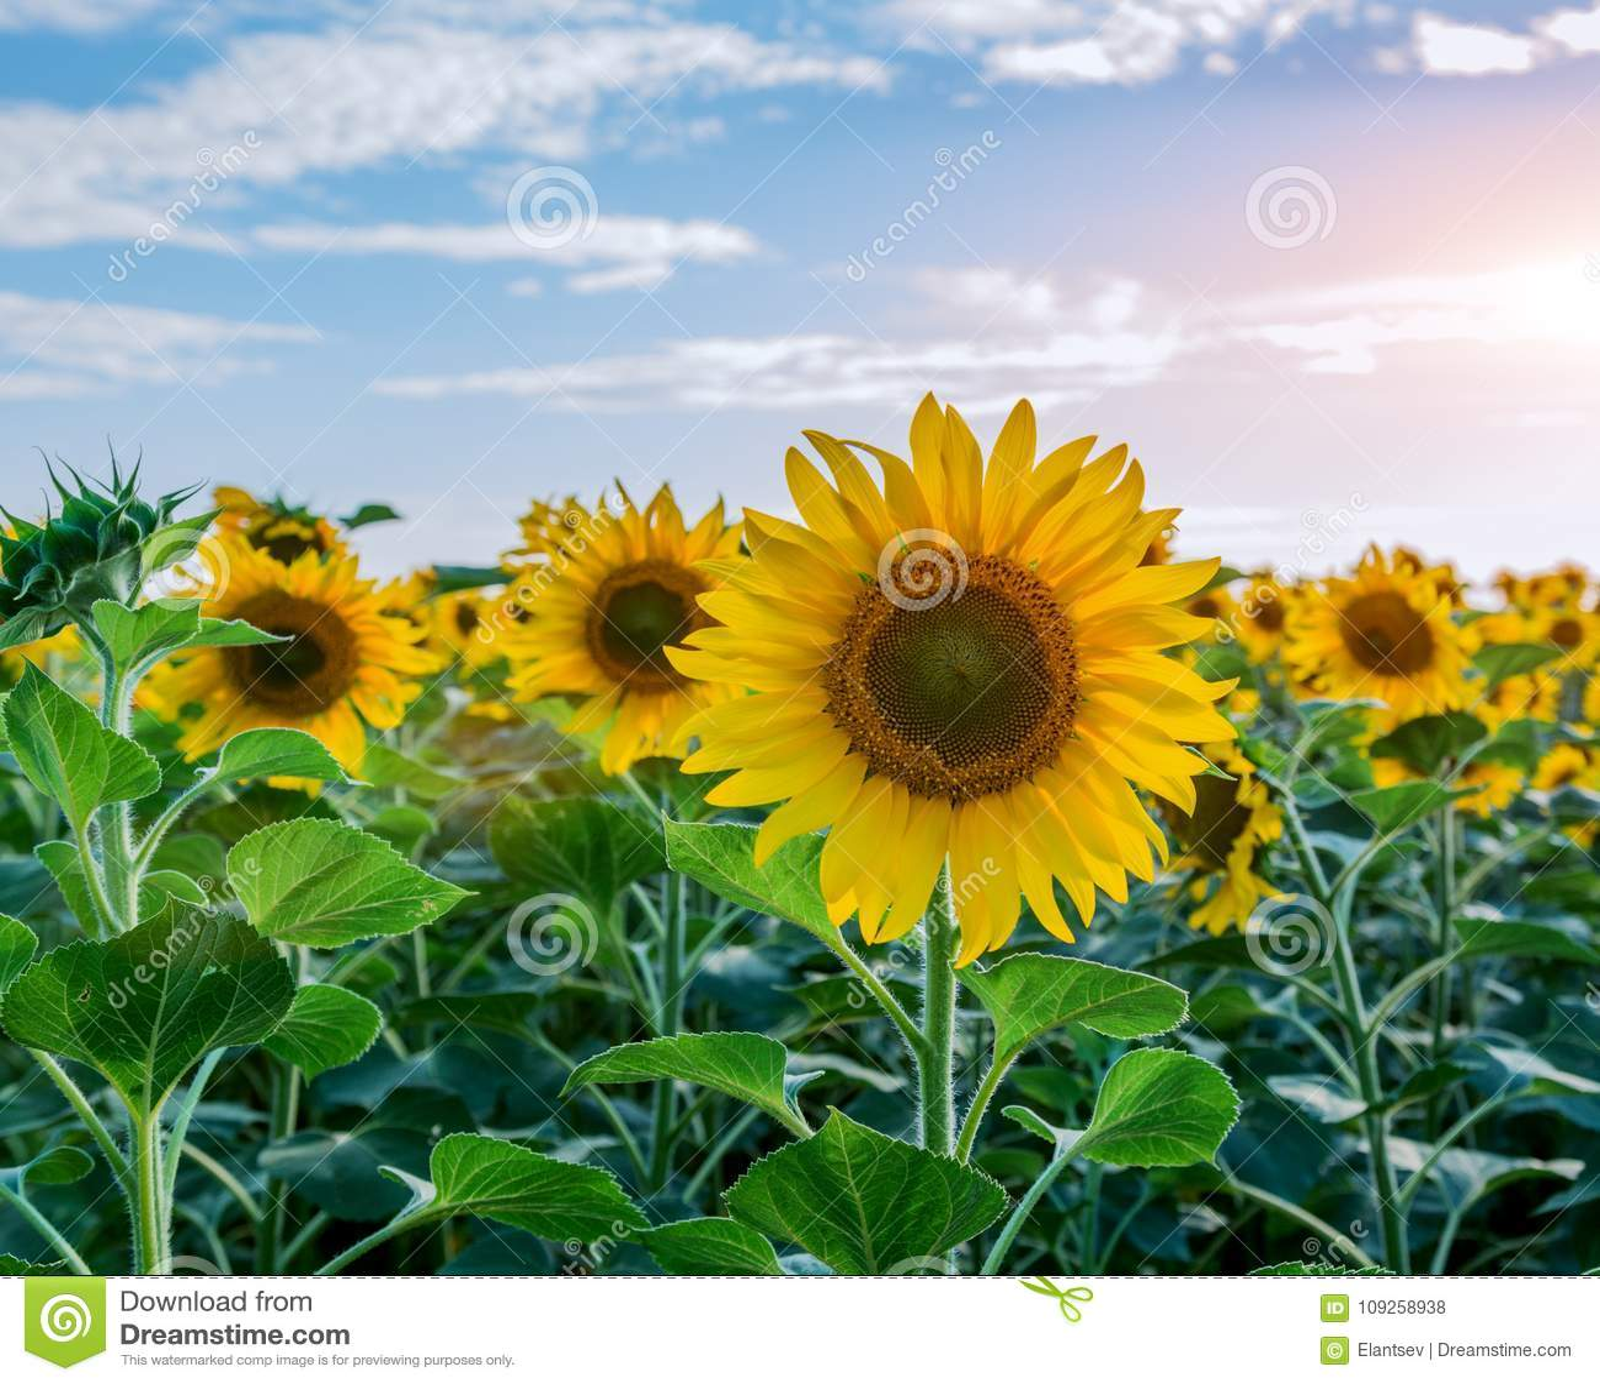 Helle gelbe, orange Sonnenblumenblume auf Sonnenblumenfeld